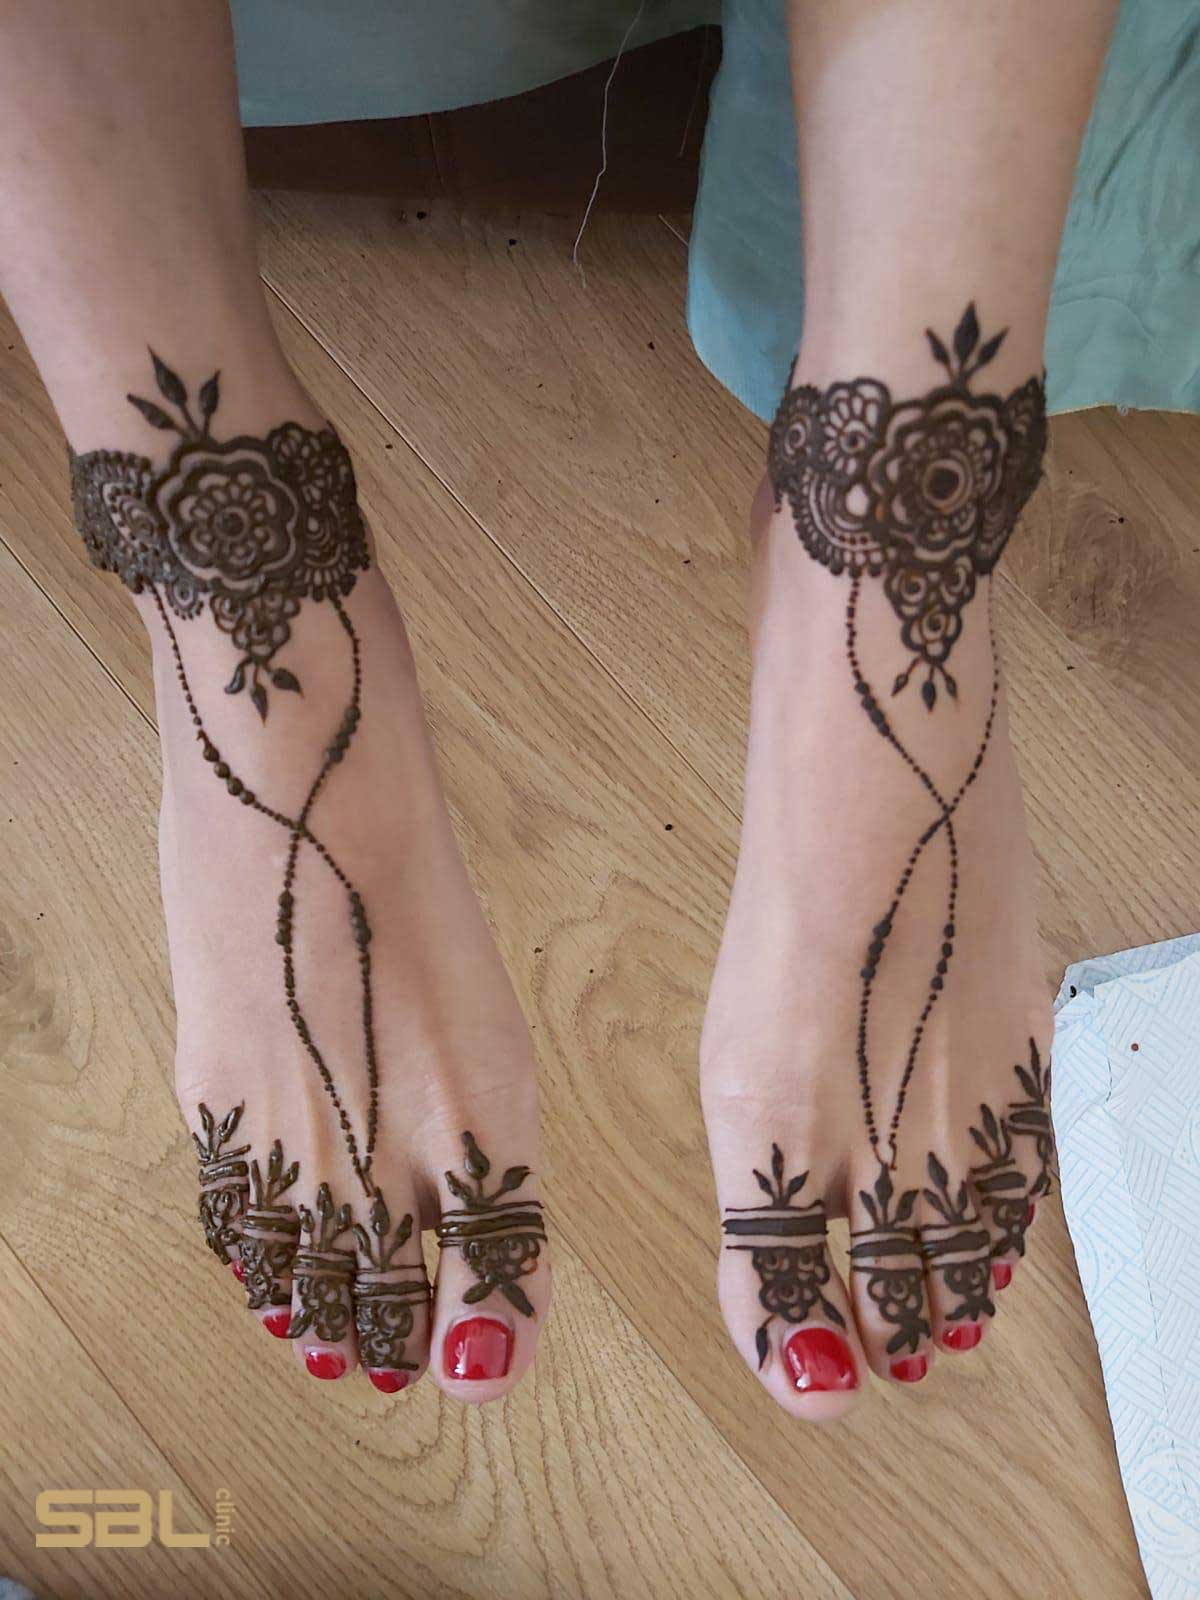 Black Henna Tattoo Uk: Henna Tattoos In London By Slim Bodyline Clinic